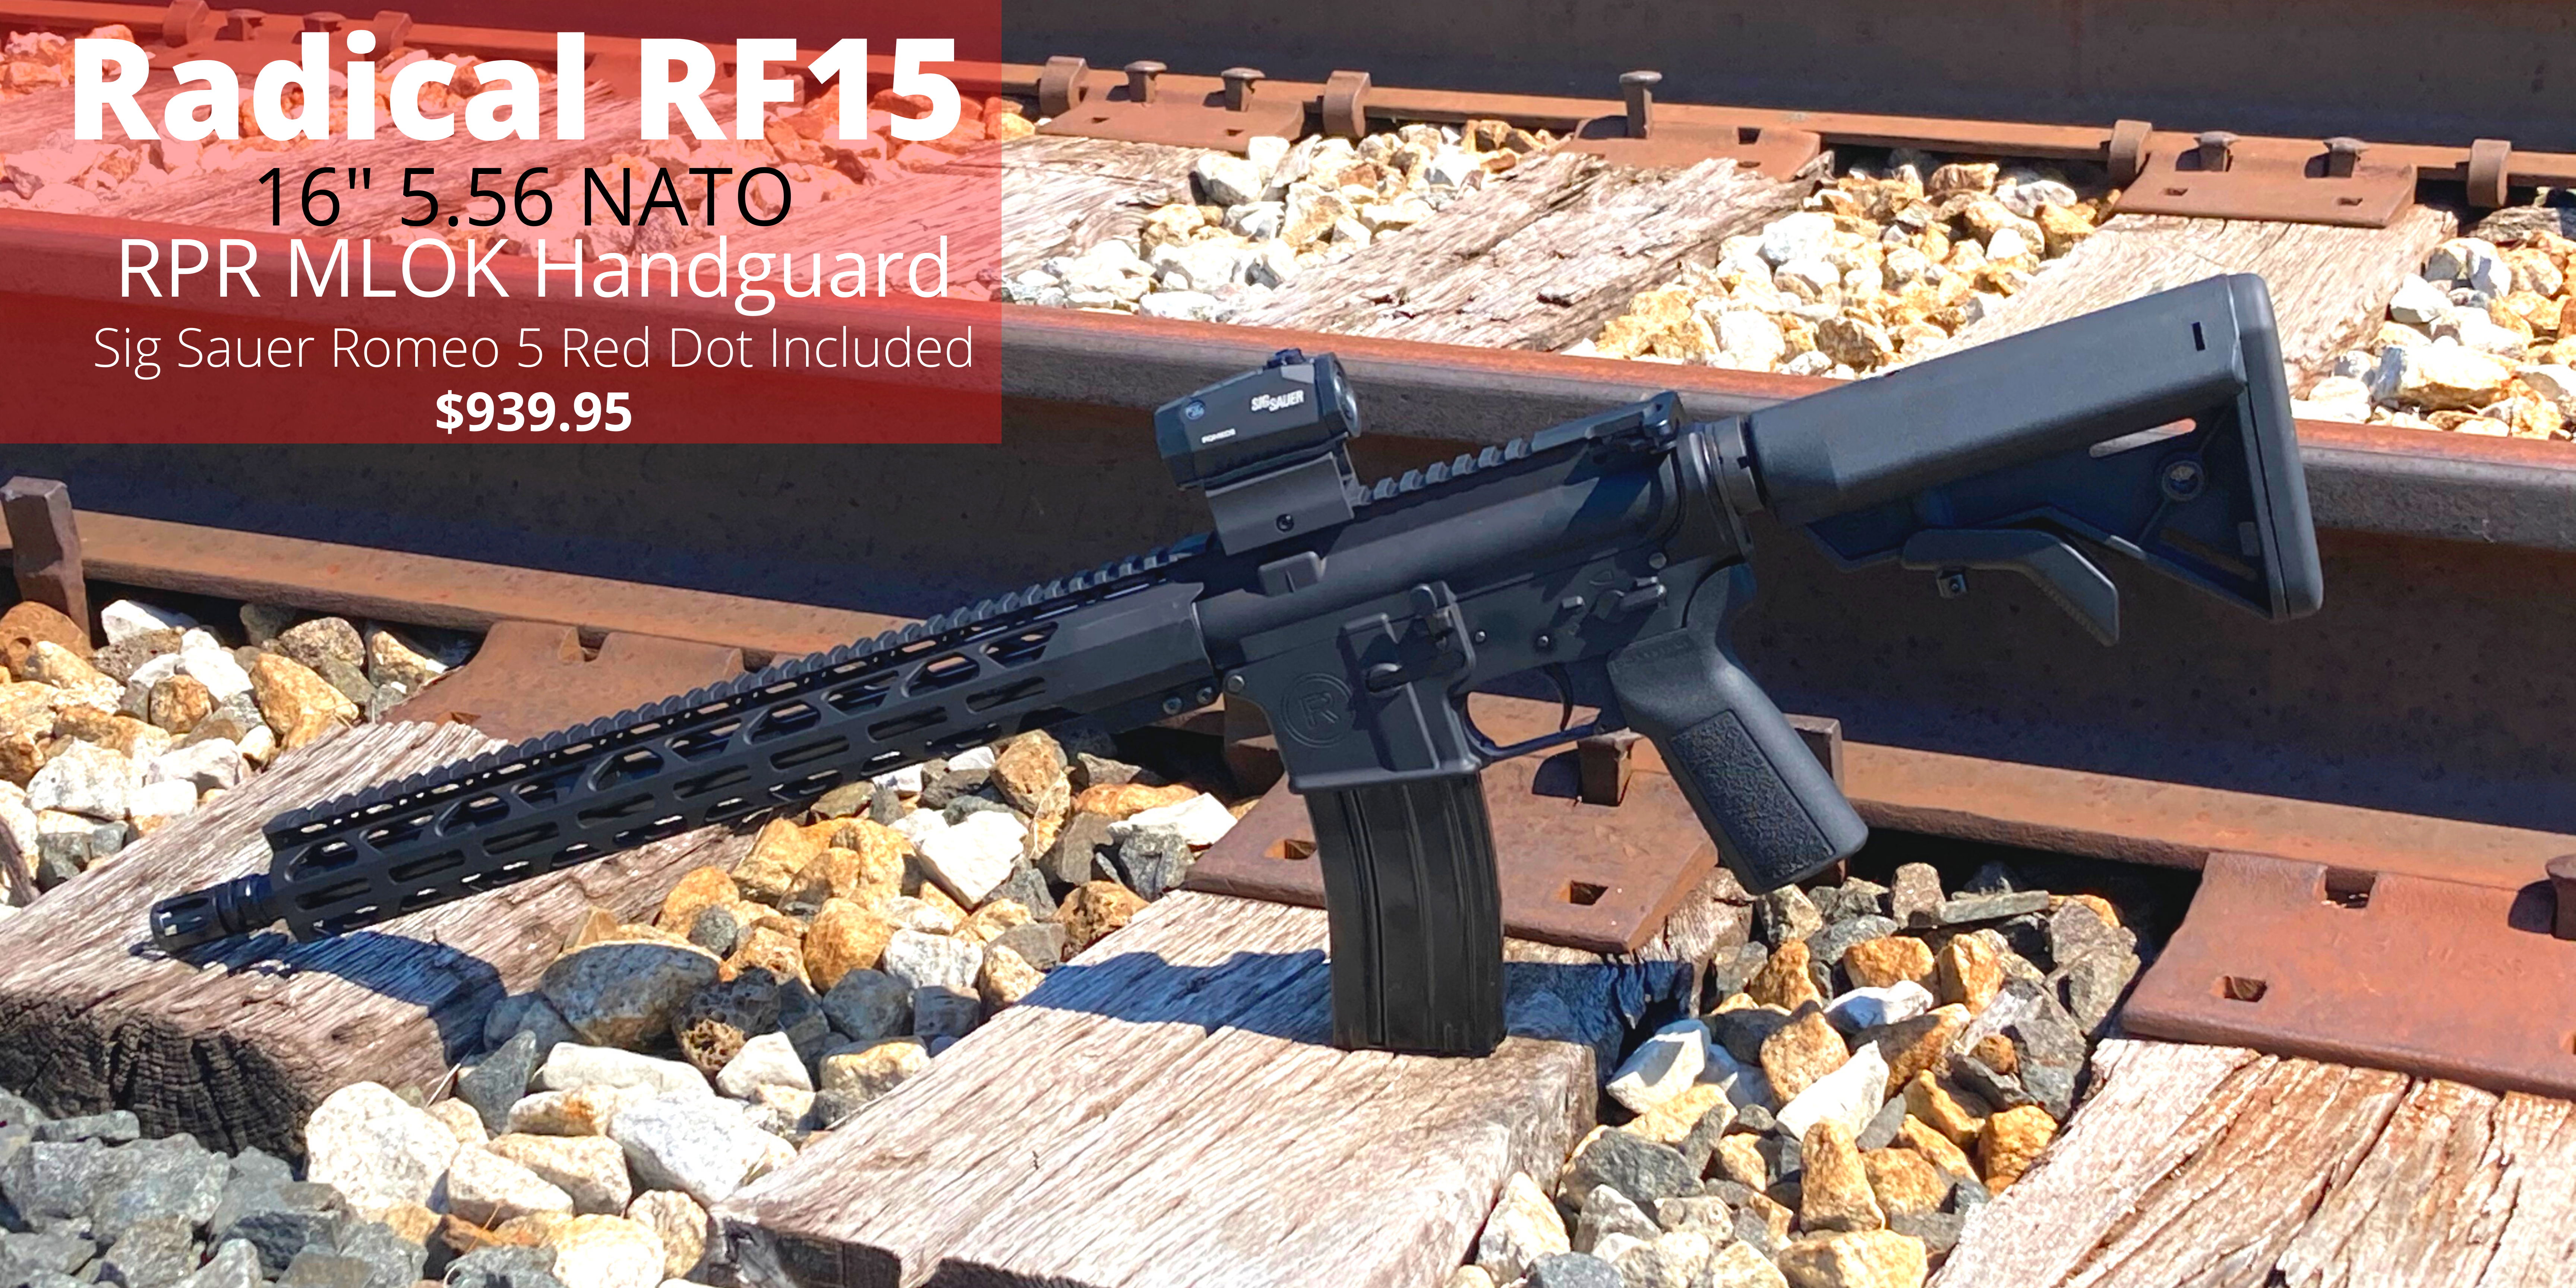 https://www.ronandjosfirearms.com/products/radical-firearms-rf00028-816903022823-632